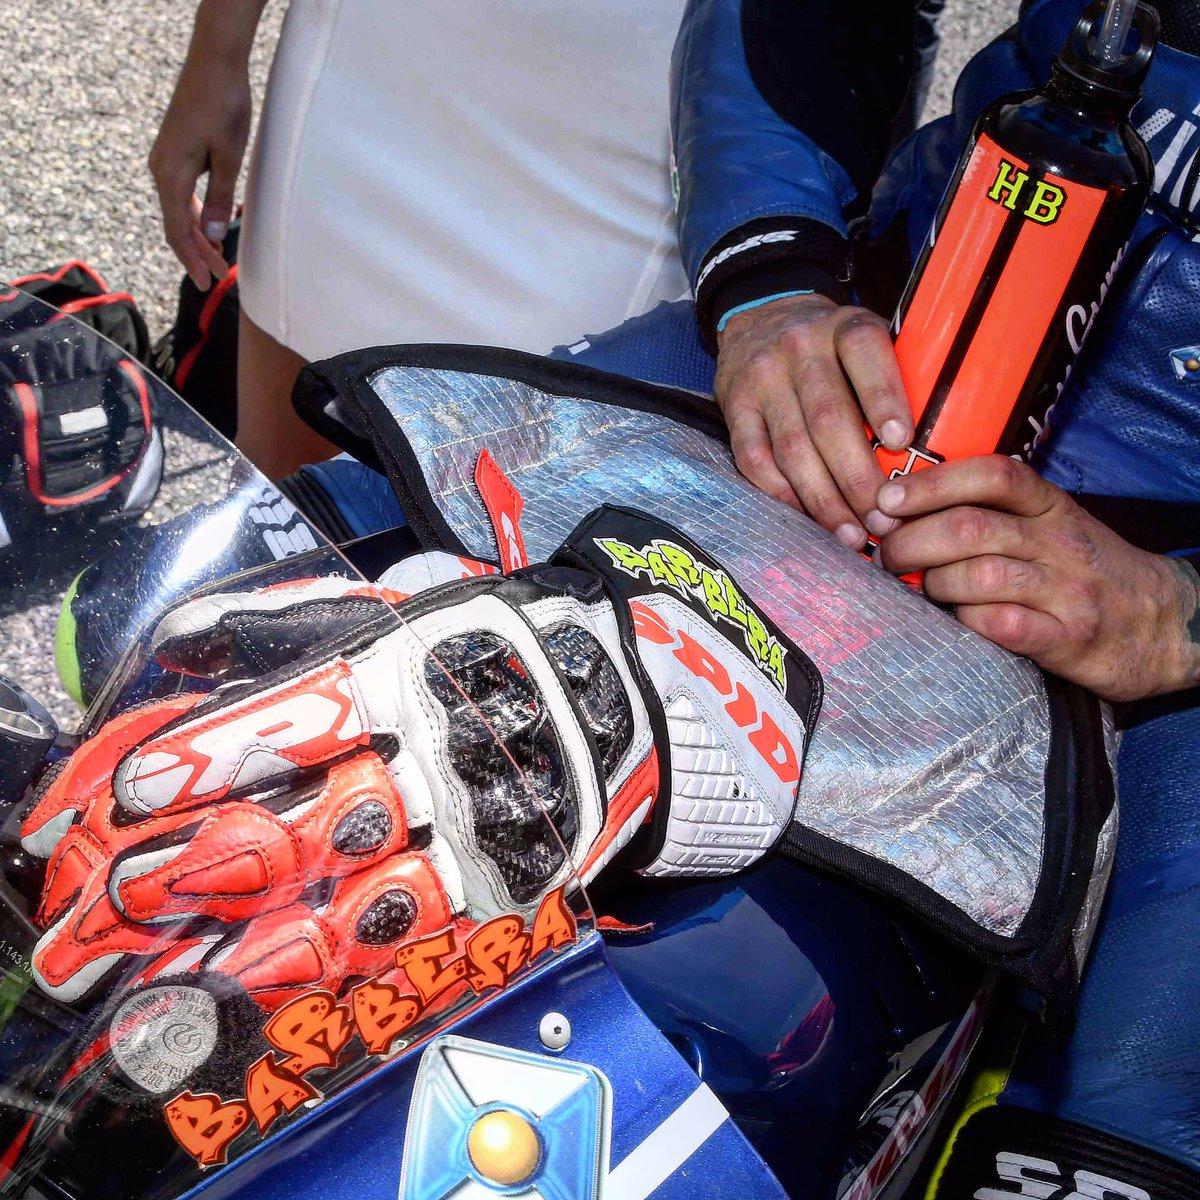 Ready to race @HectorBarbera #SpanishGP @MotoGP @realeavintia #spidiwarrior #ridetrue #speed #bikes #bikers #race